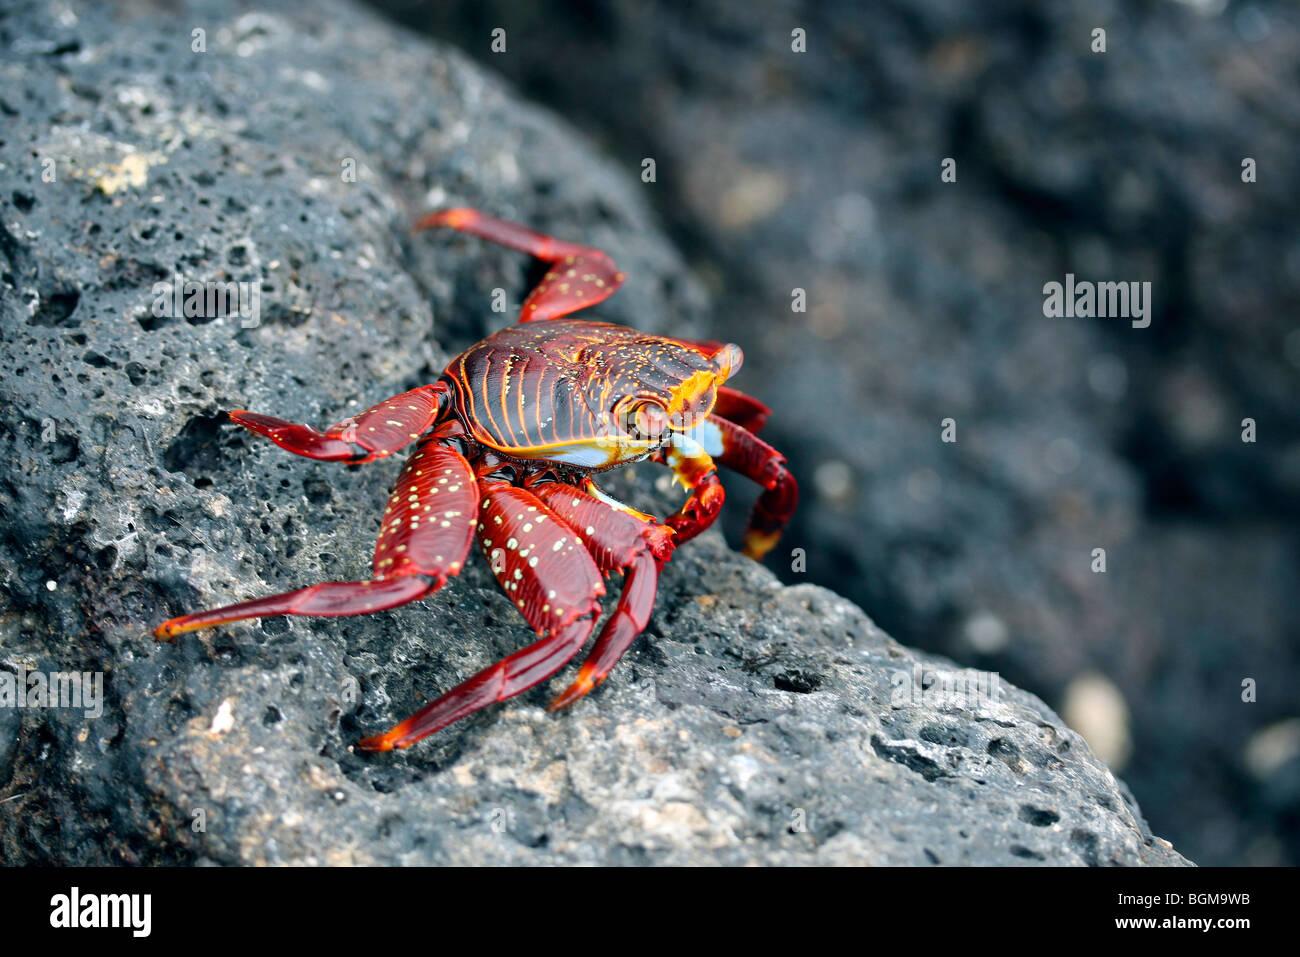 Sally lightfoot crab / red rock crab / abuete negro (Grapsus grapsus) on rock, Galápagos Islands, Ecuador, - Stock Image